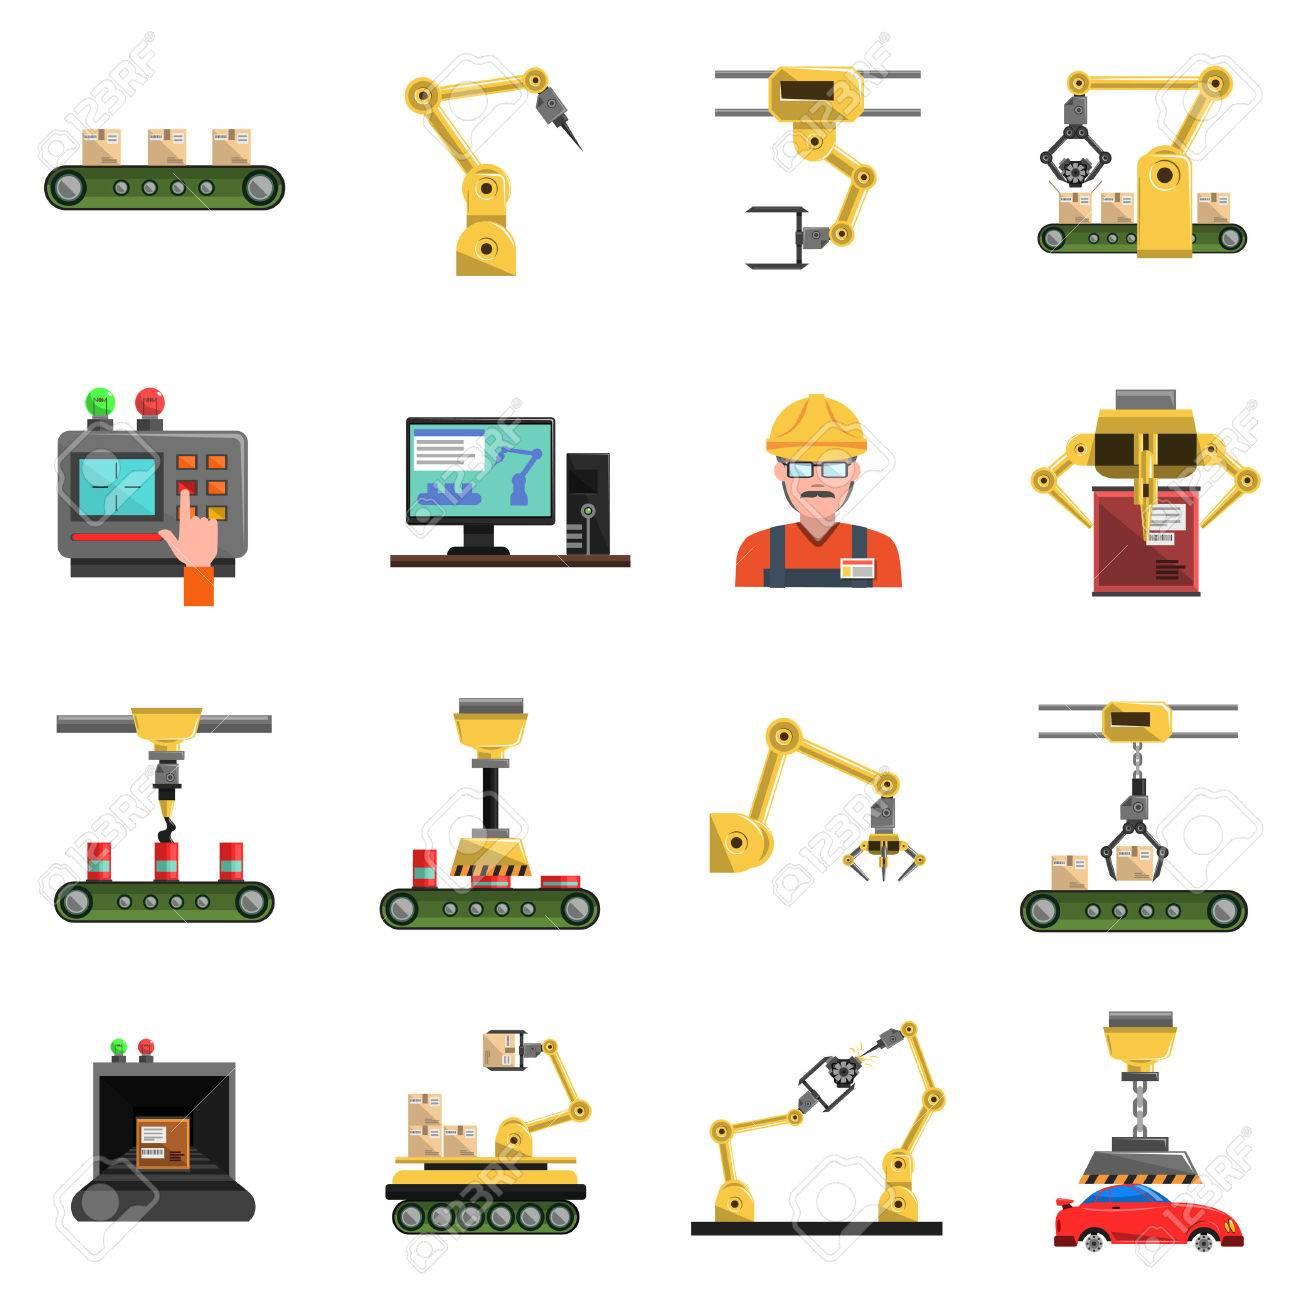 Robot Icons Set With Conveyor Mechanic And Electronics Symbols ...